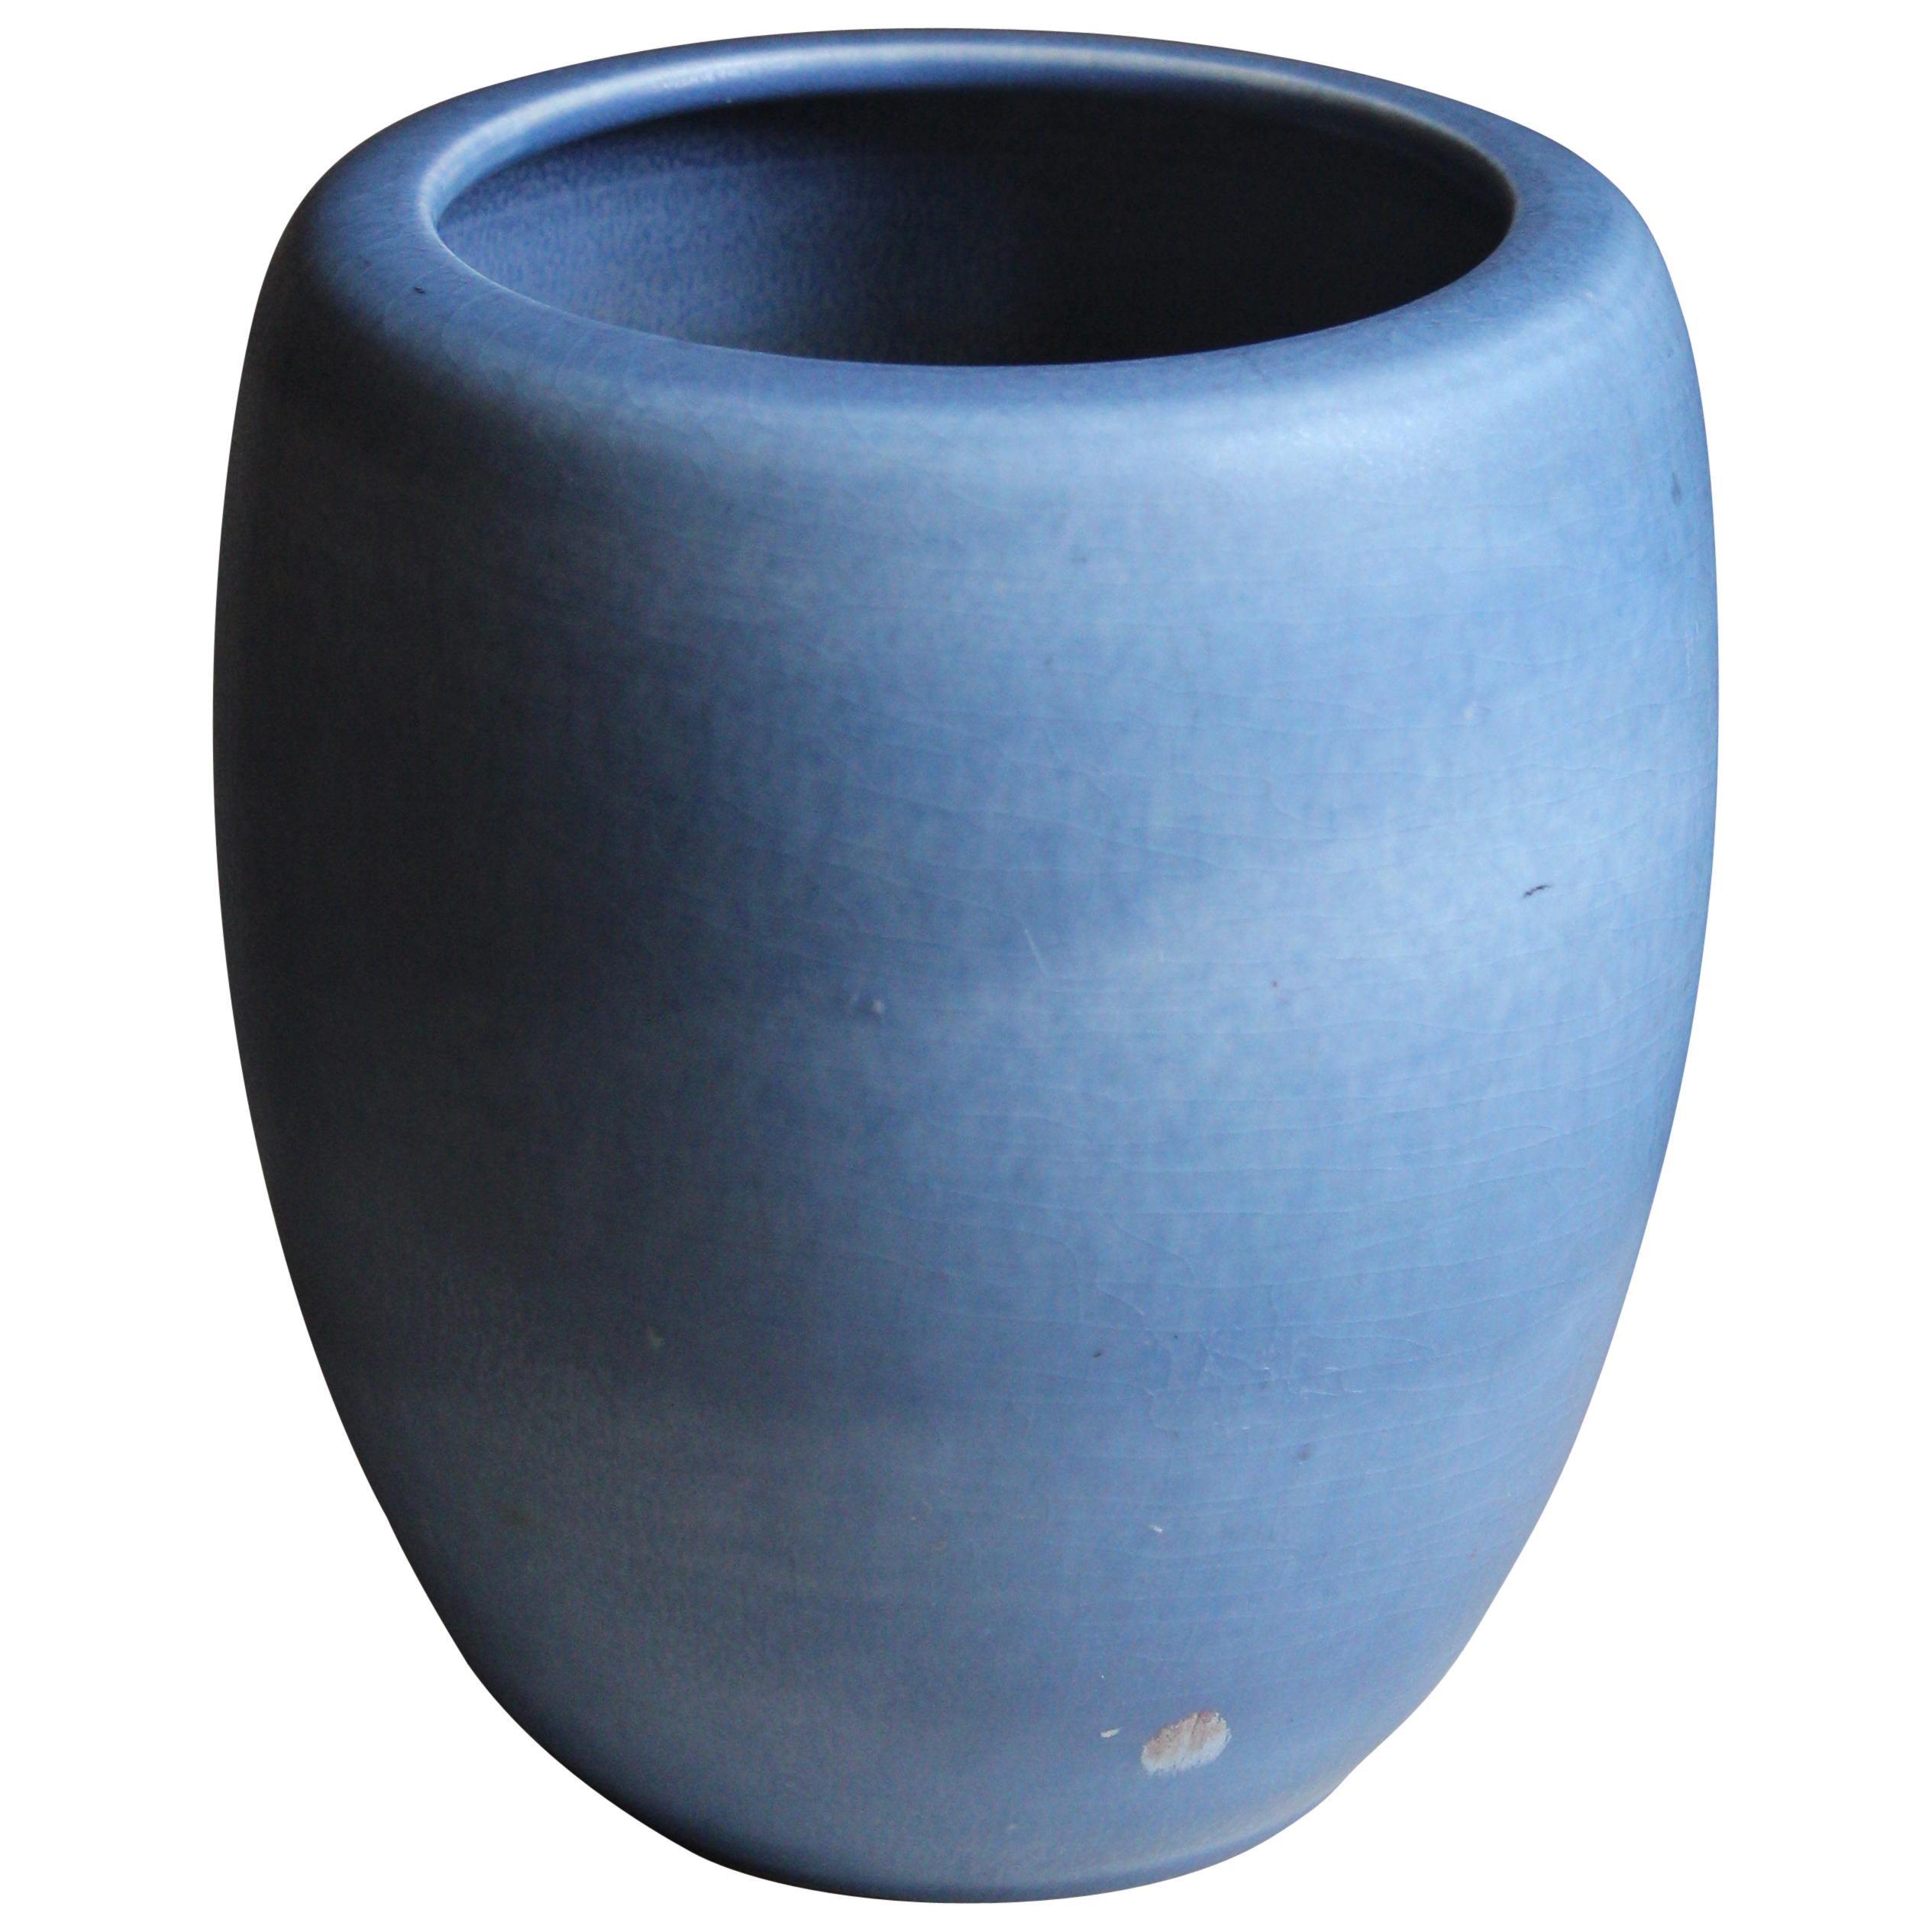 Gertrud Lönegren, Modernist Vase, Blue Glazed Stoneware, Rörstrand, 1950s